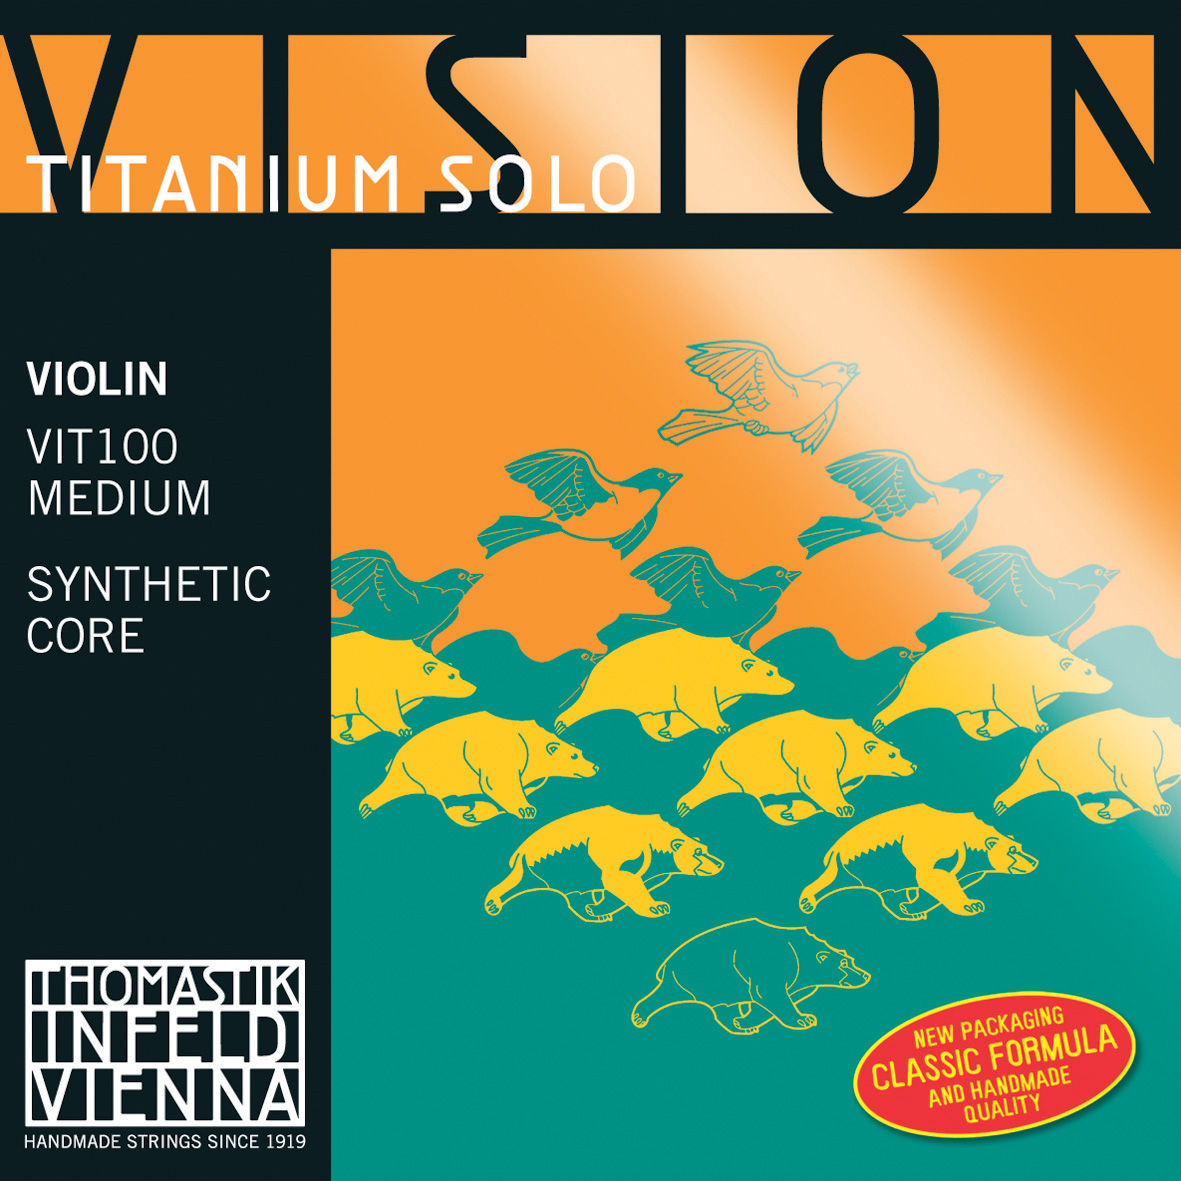 Vision Titanium Solo Thomastik Strings